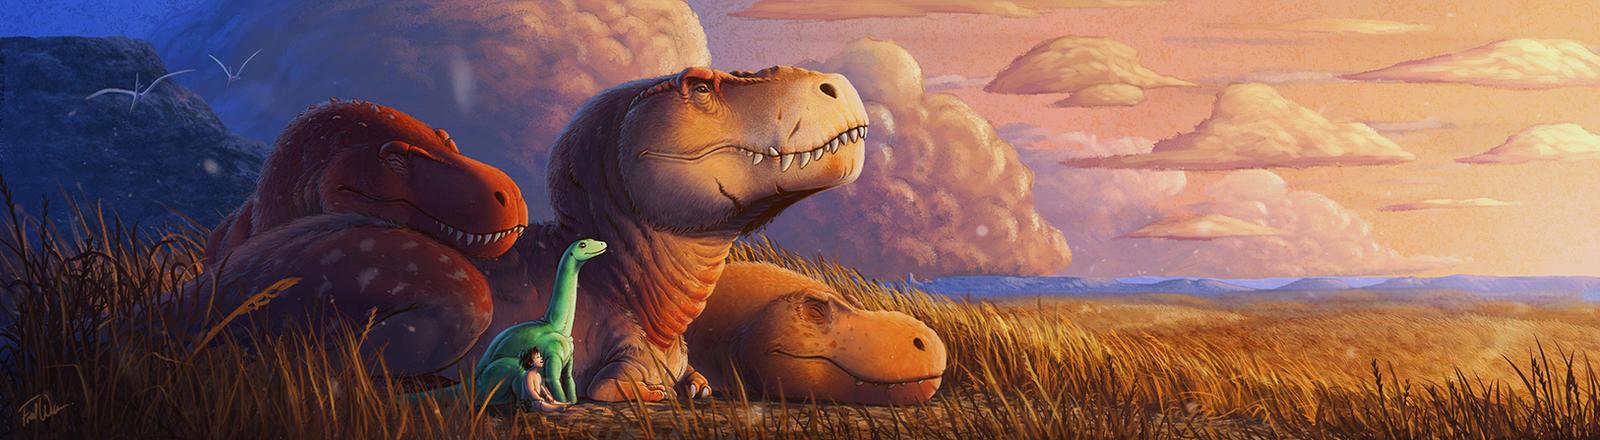 Dinosaur Sunset - The Good Dinosaur Fan Art